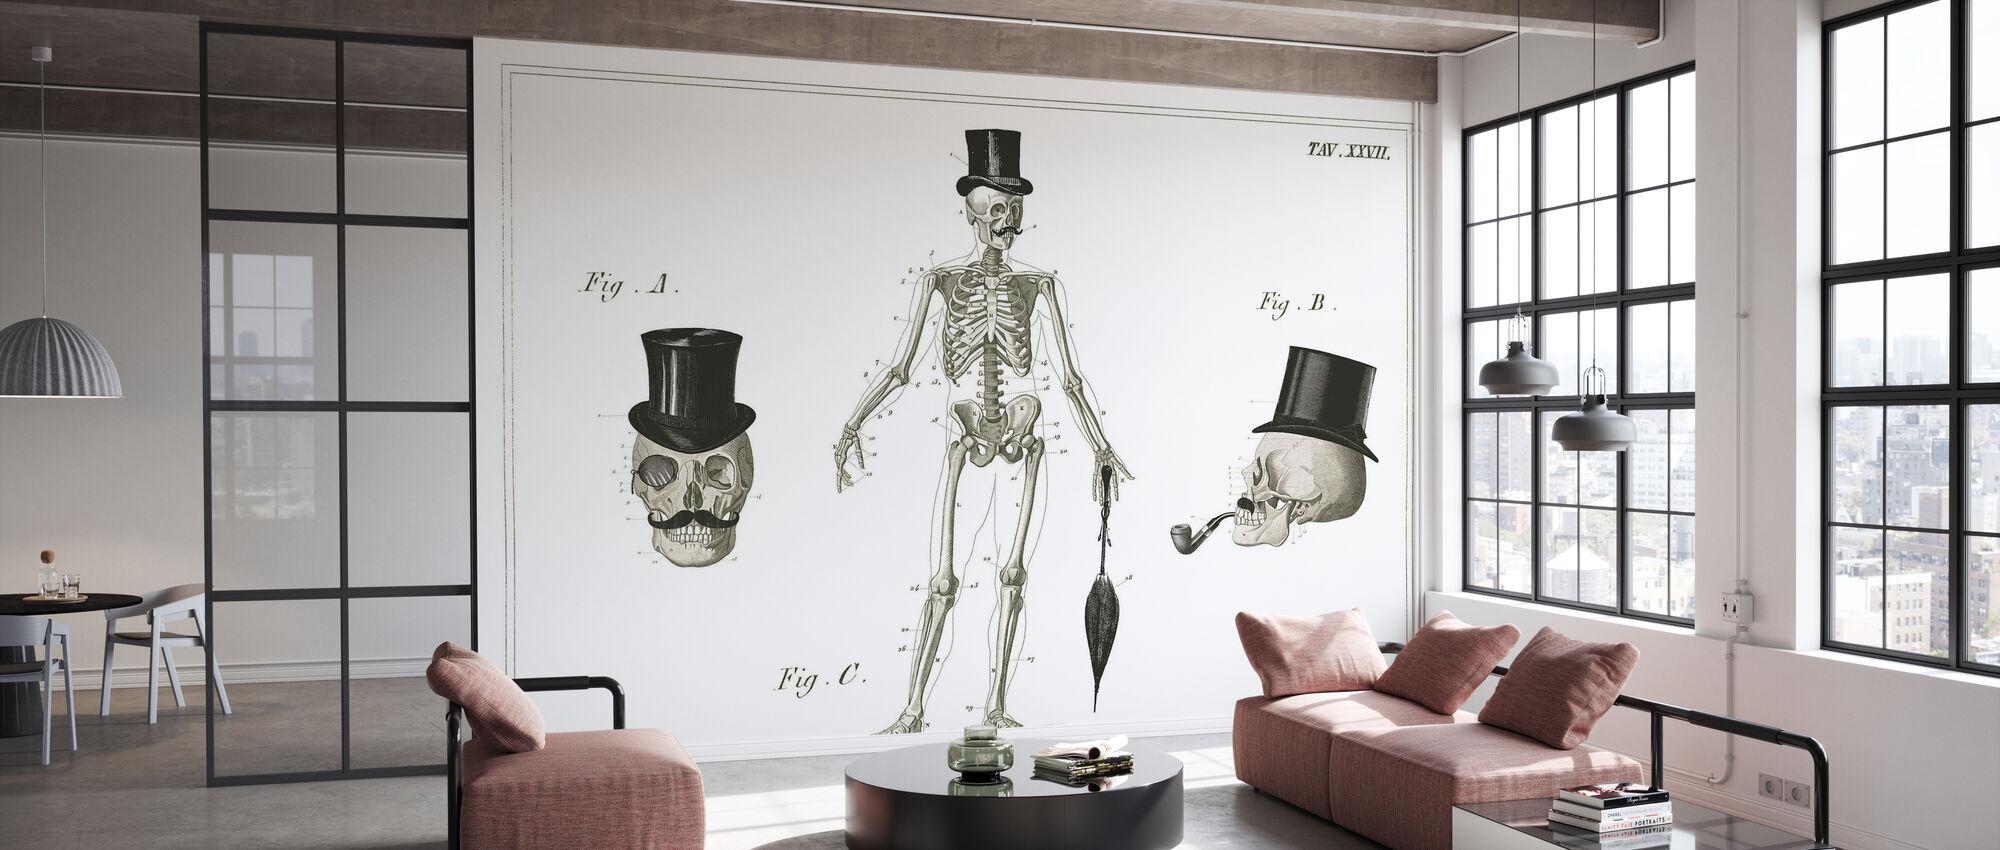 Dandy Bones - Wallpaper - Office